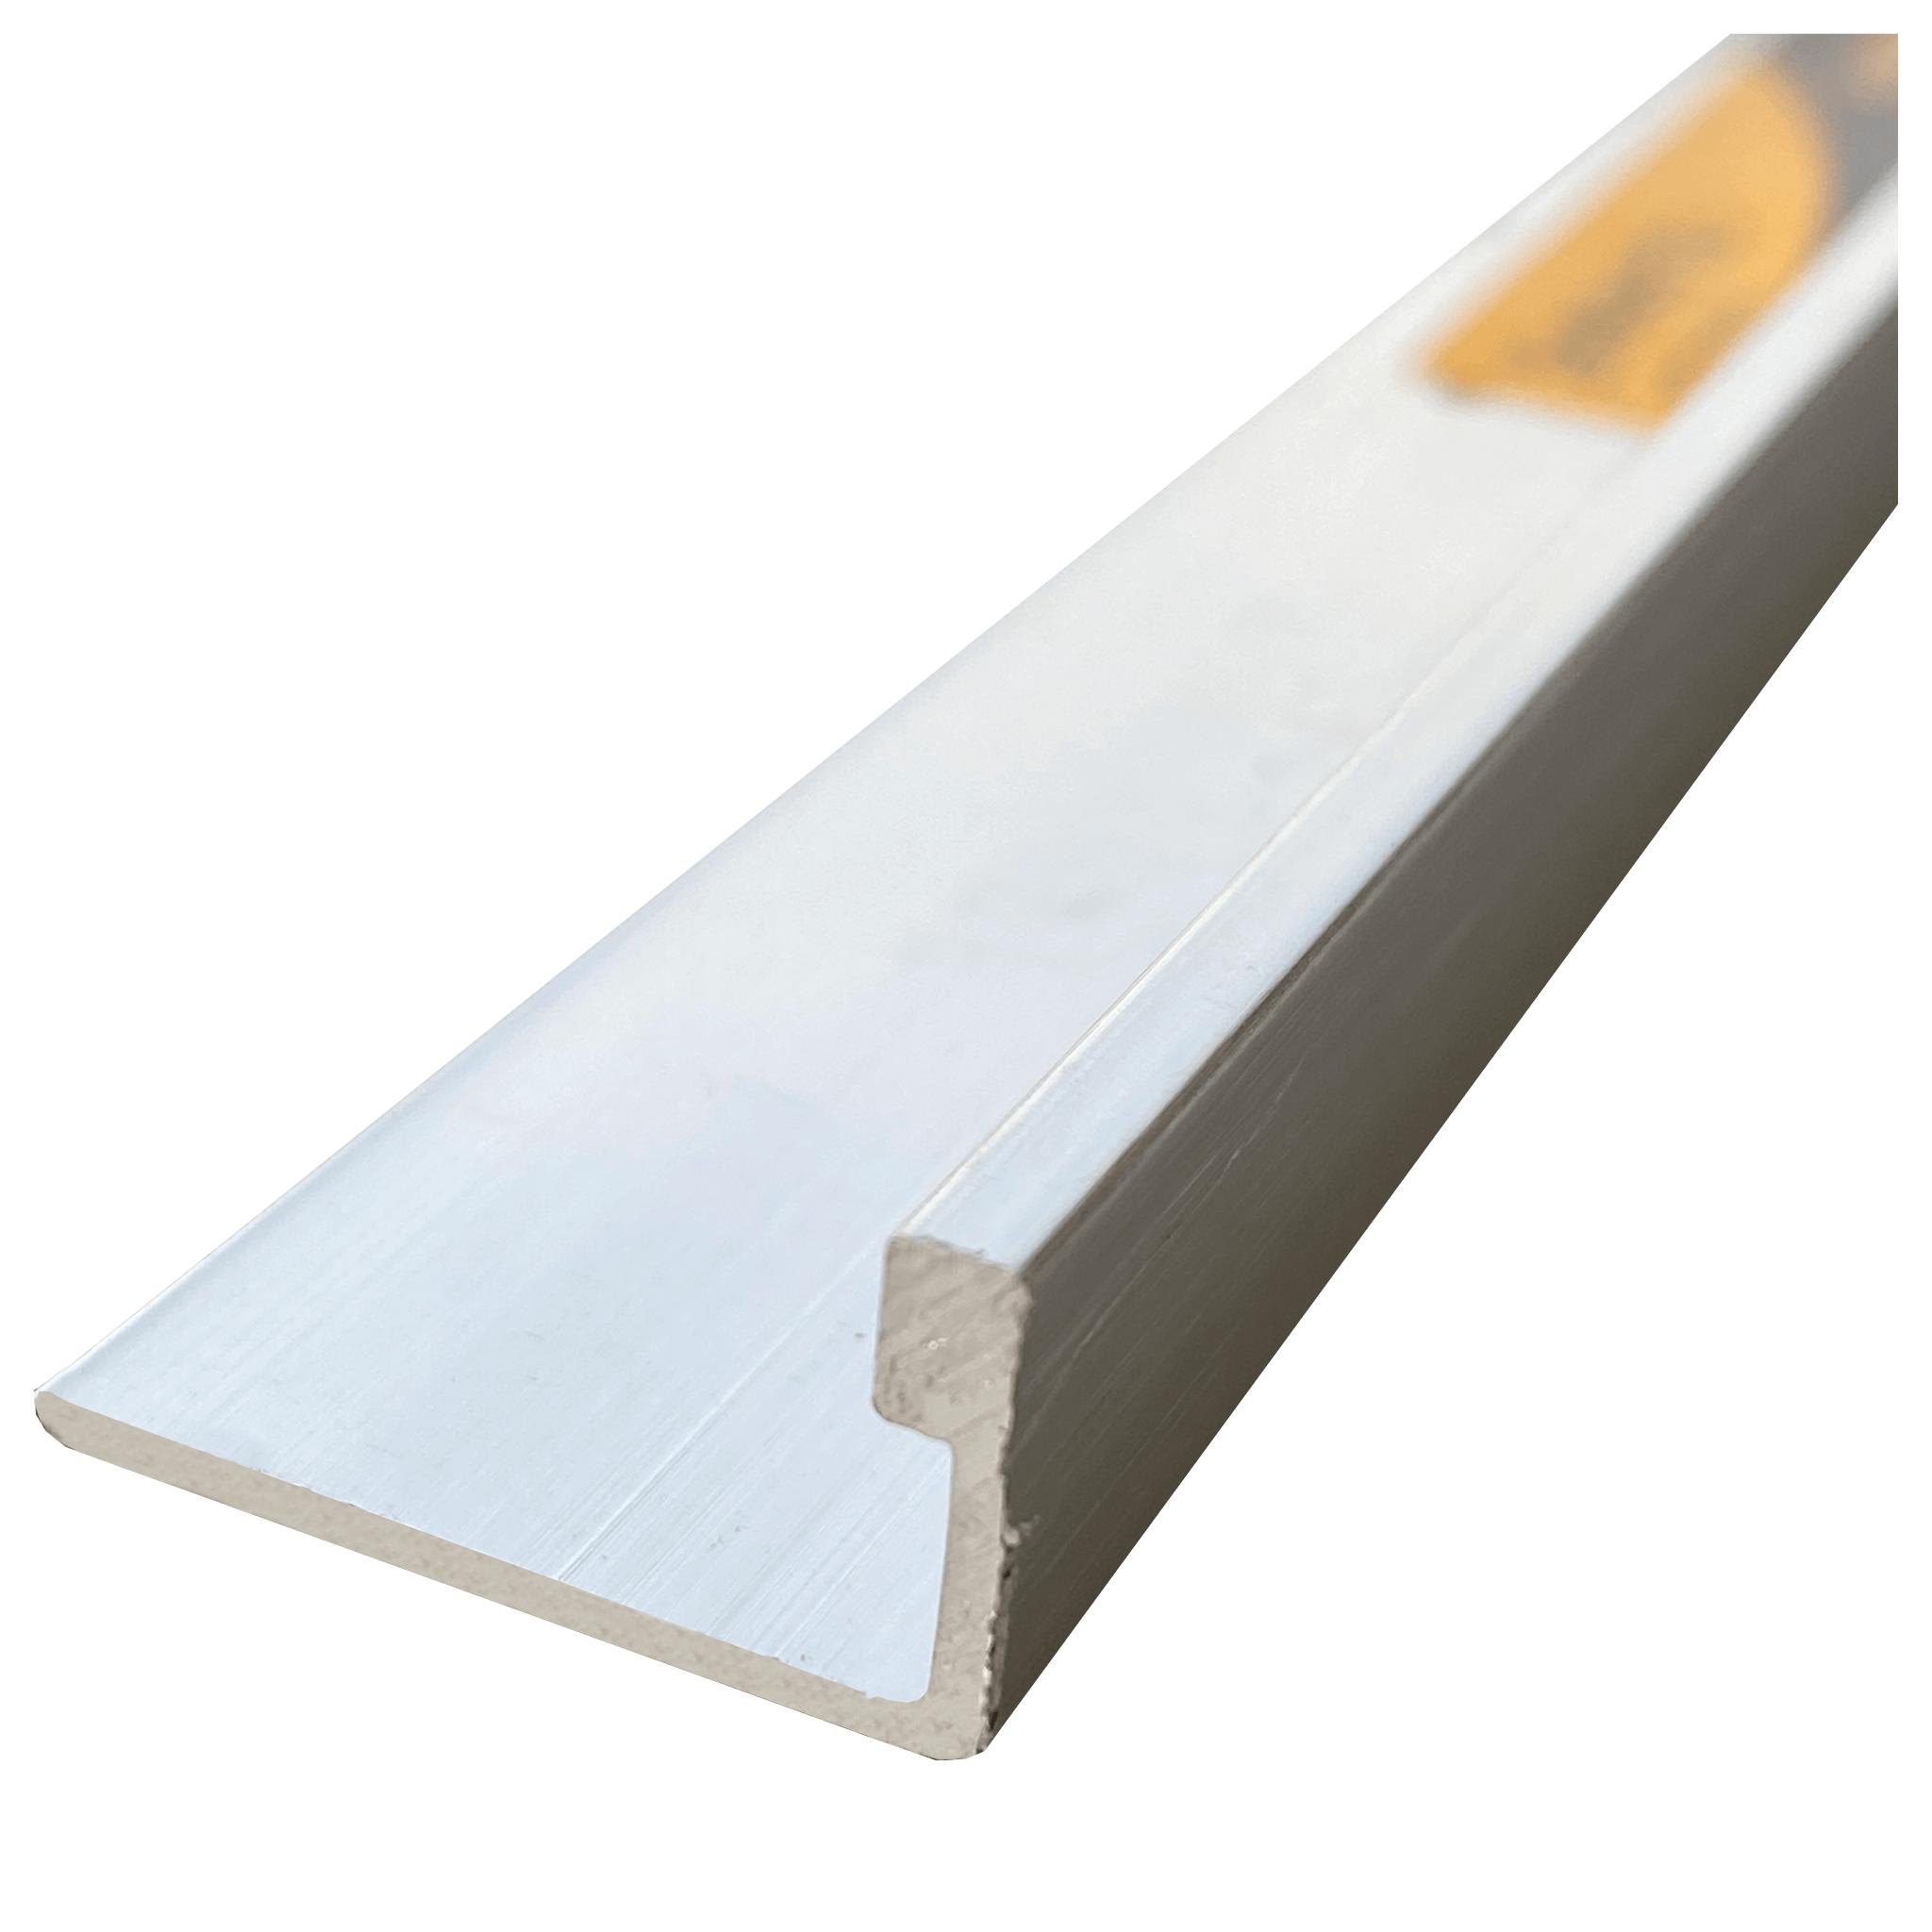 Roberts Designs L-Shape Trim – Aluminum 3m